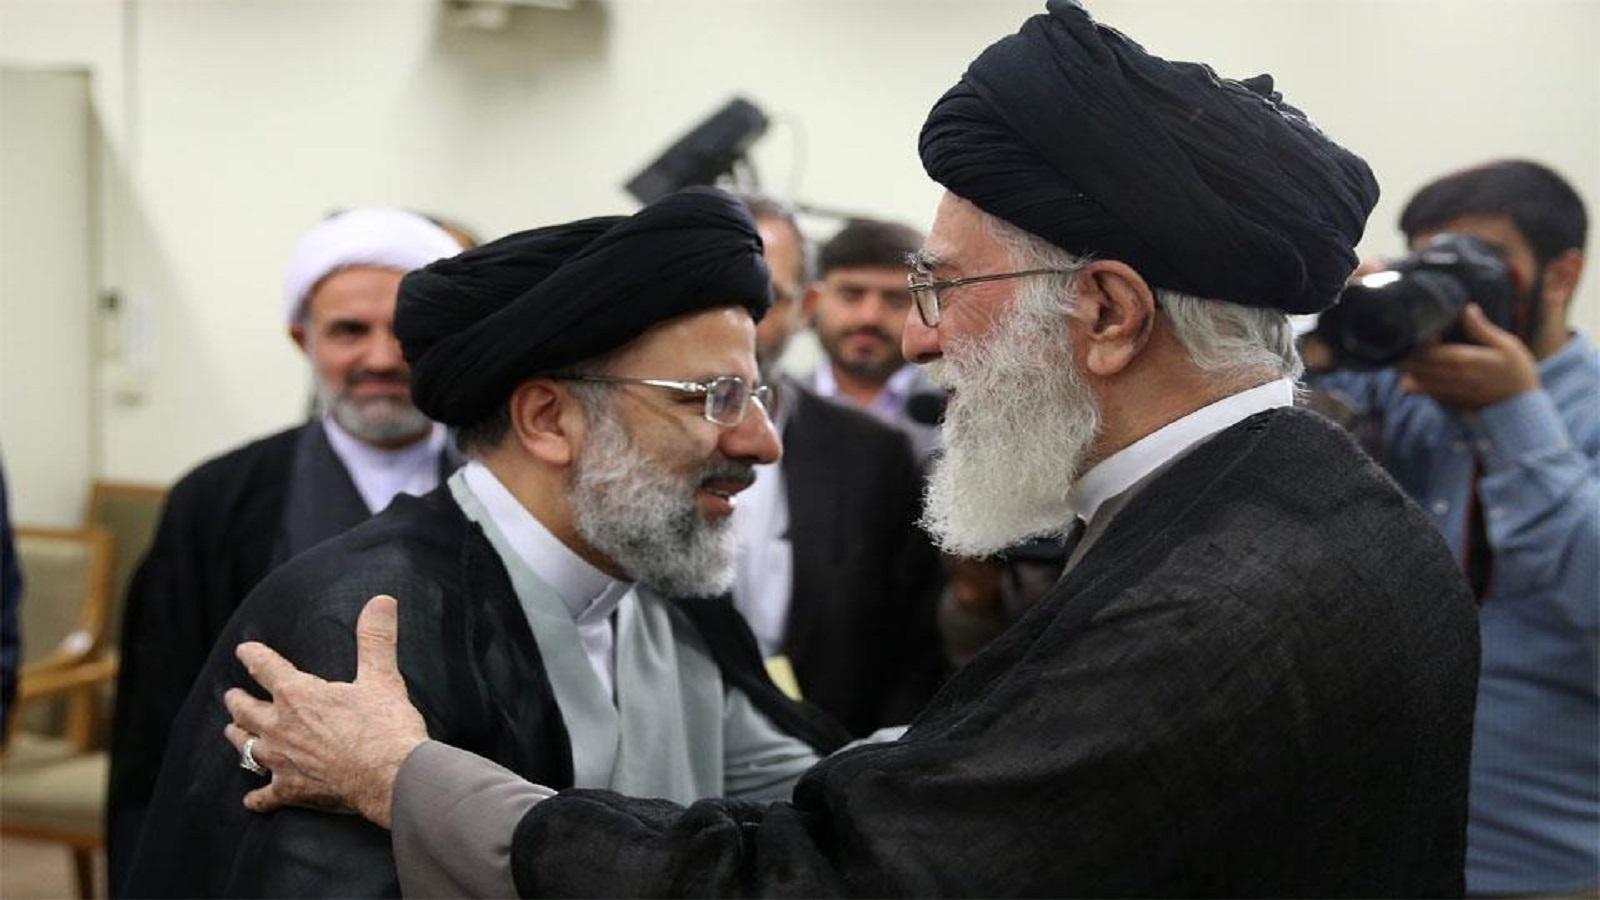 https://npasyria.com/en/wp-content/uploads/2021/06/Supreme-Leader-of-Iran-Ali-Khamenei-and-the-new-Iranian-President-Ebrahim-Raisi-Circulated.jpg